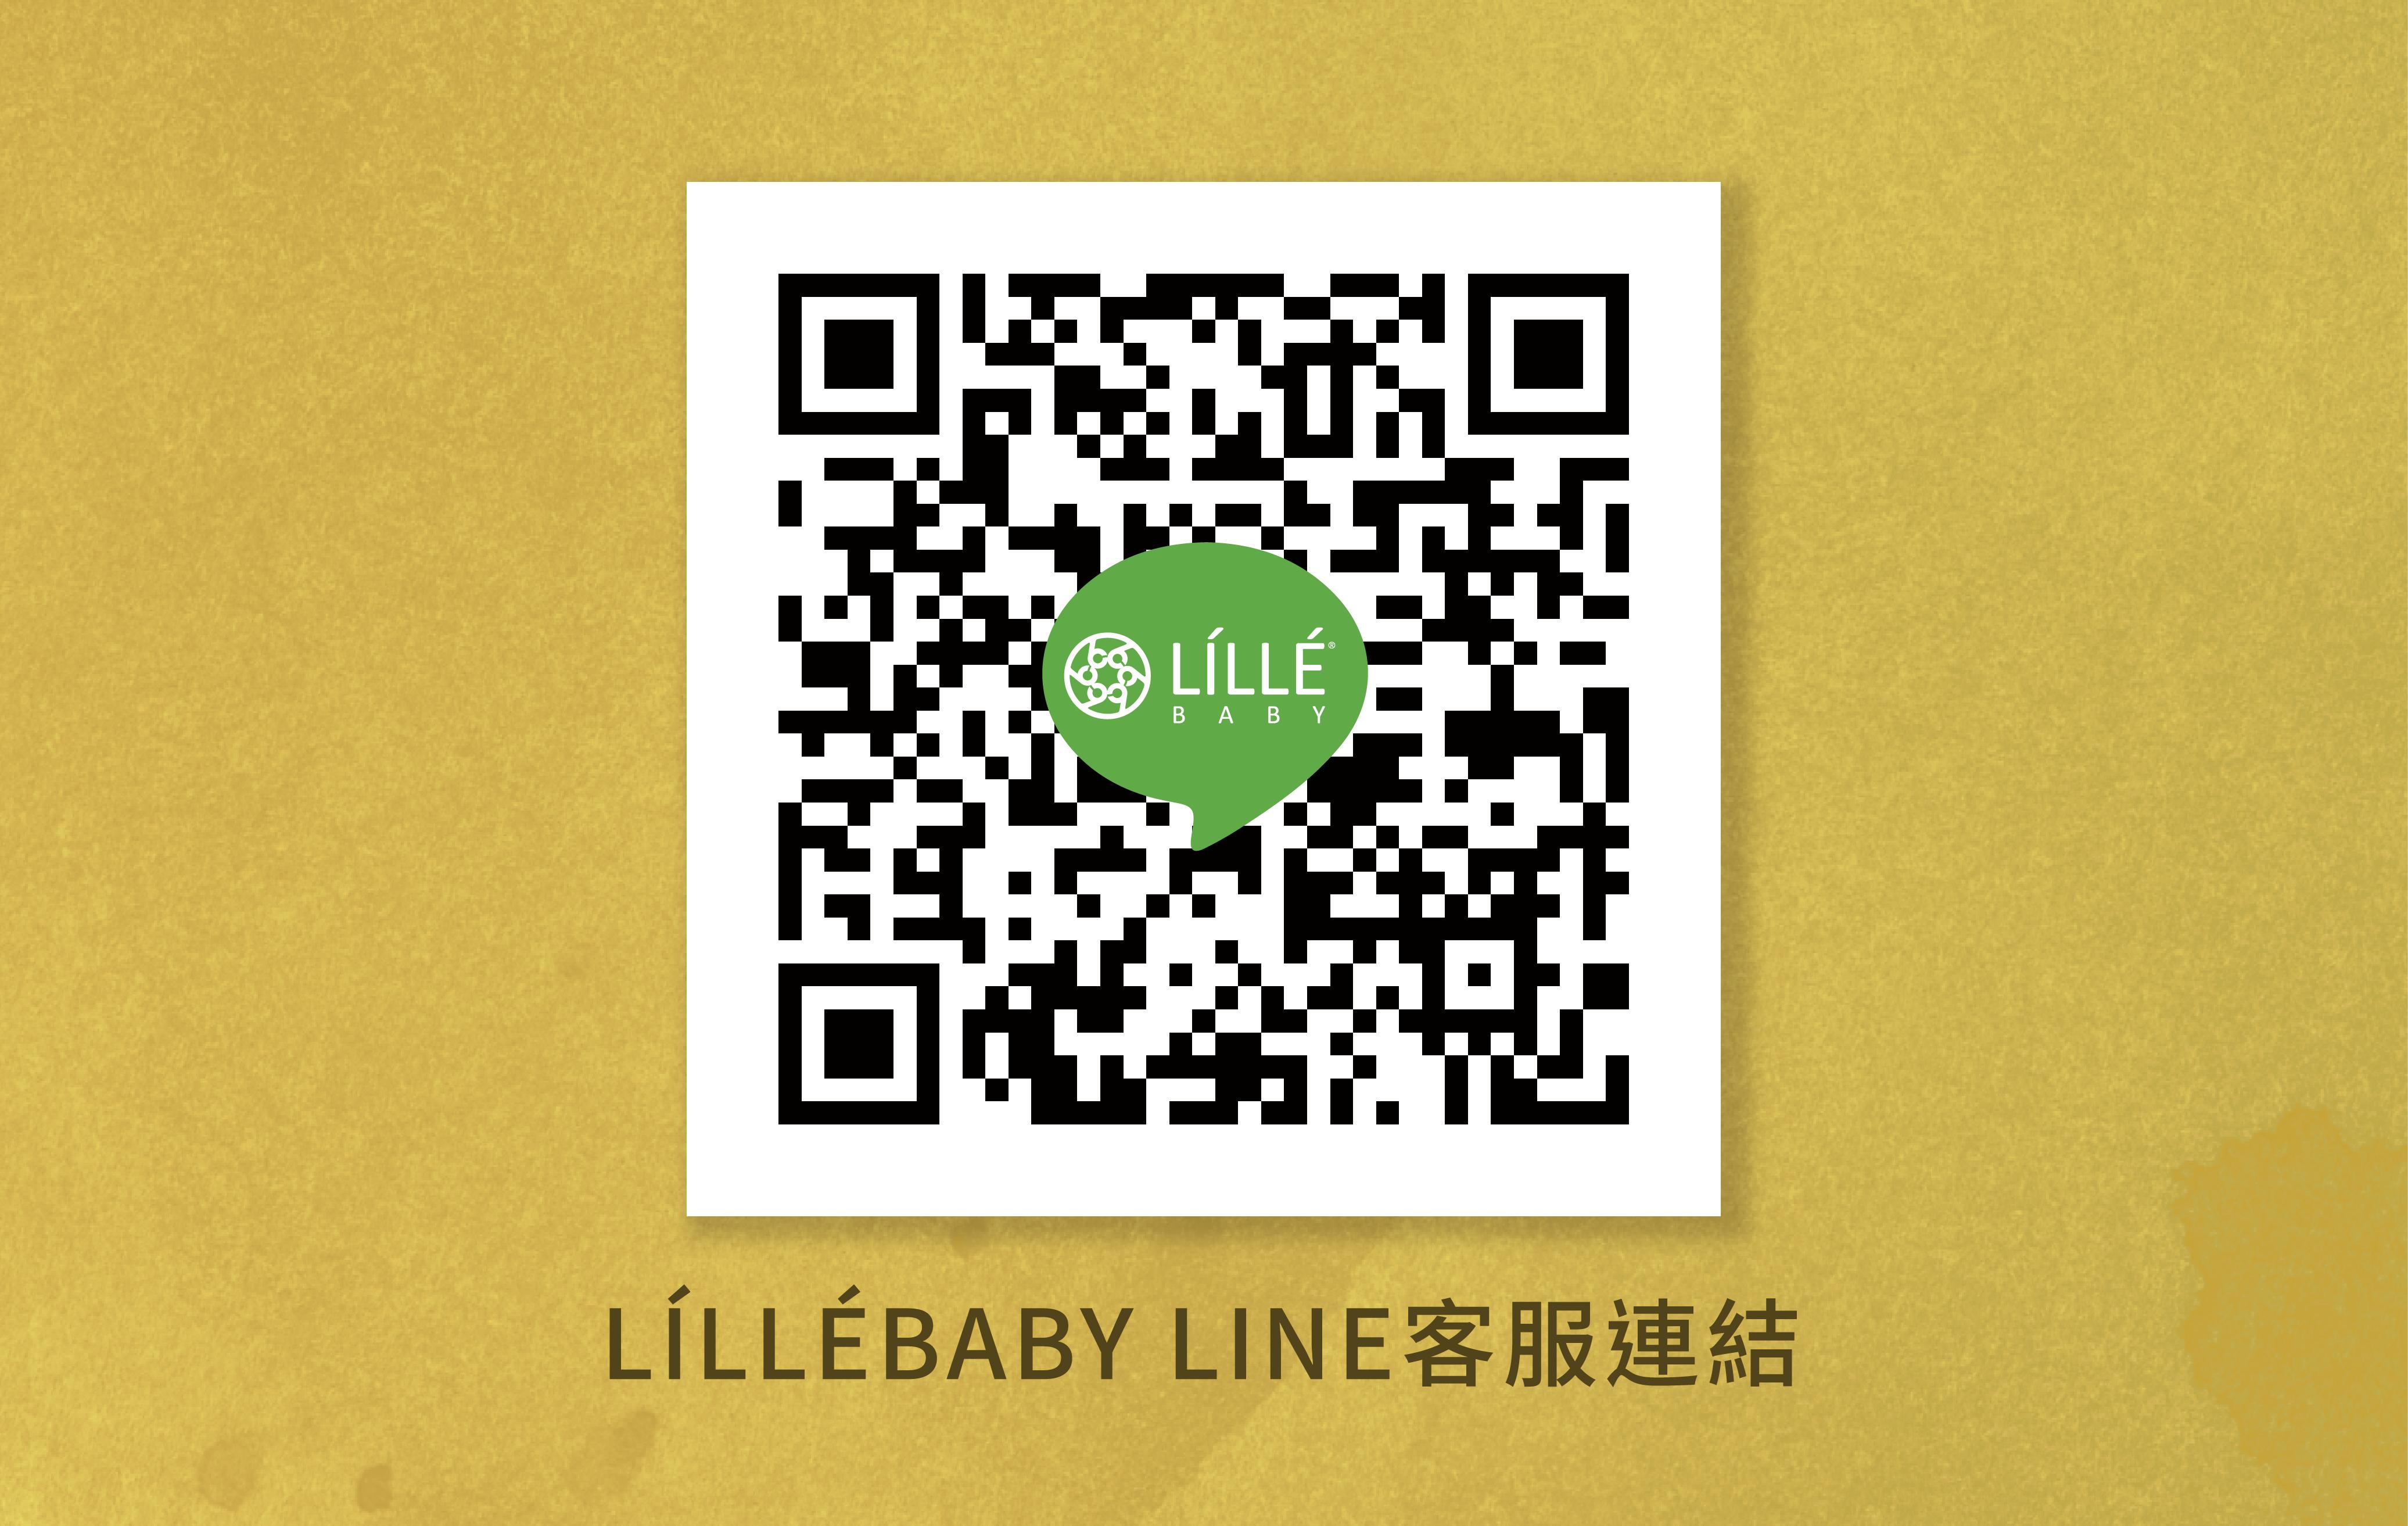 lillebaby-line